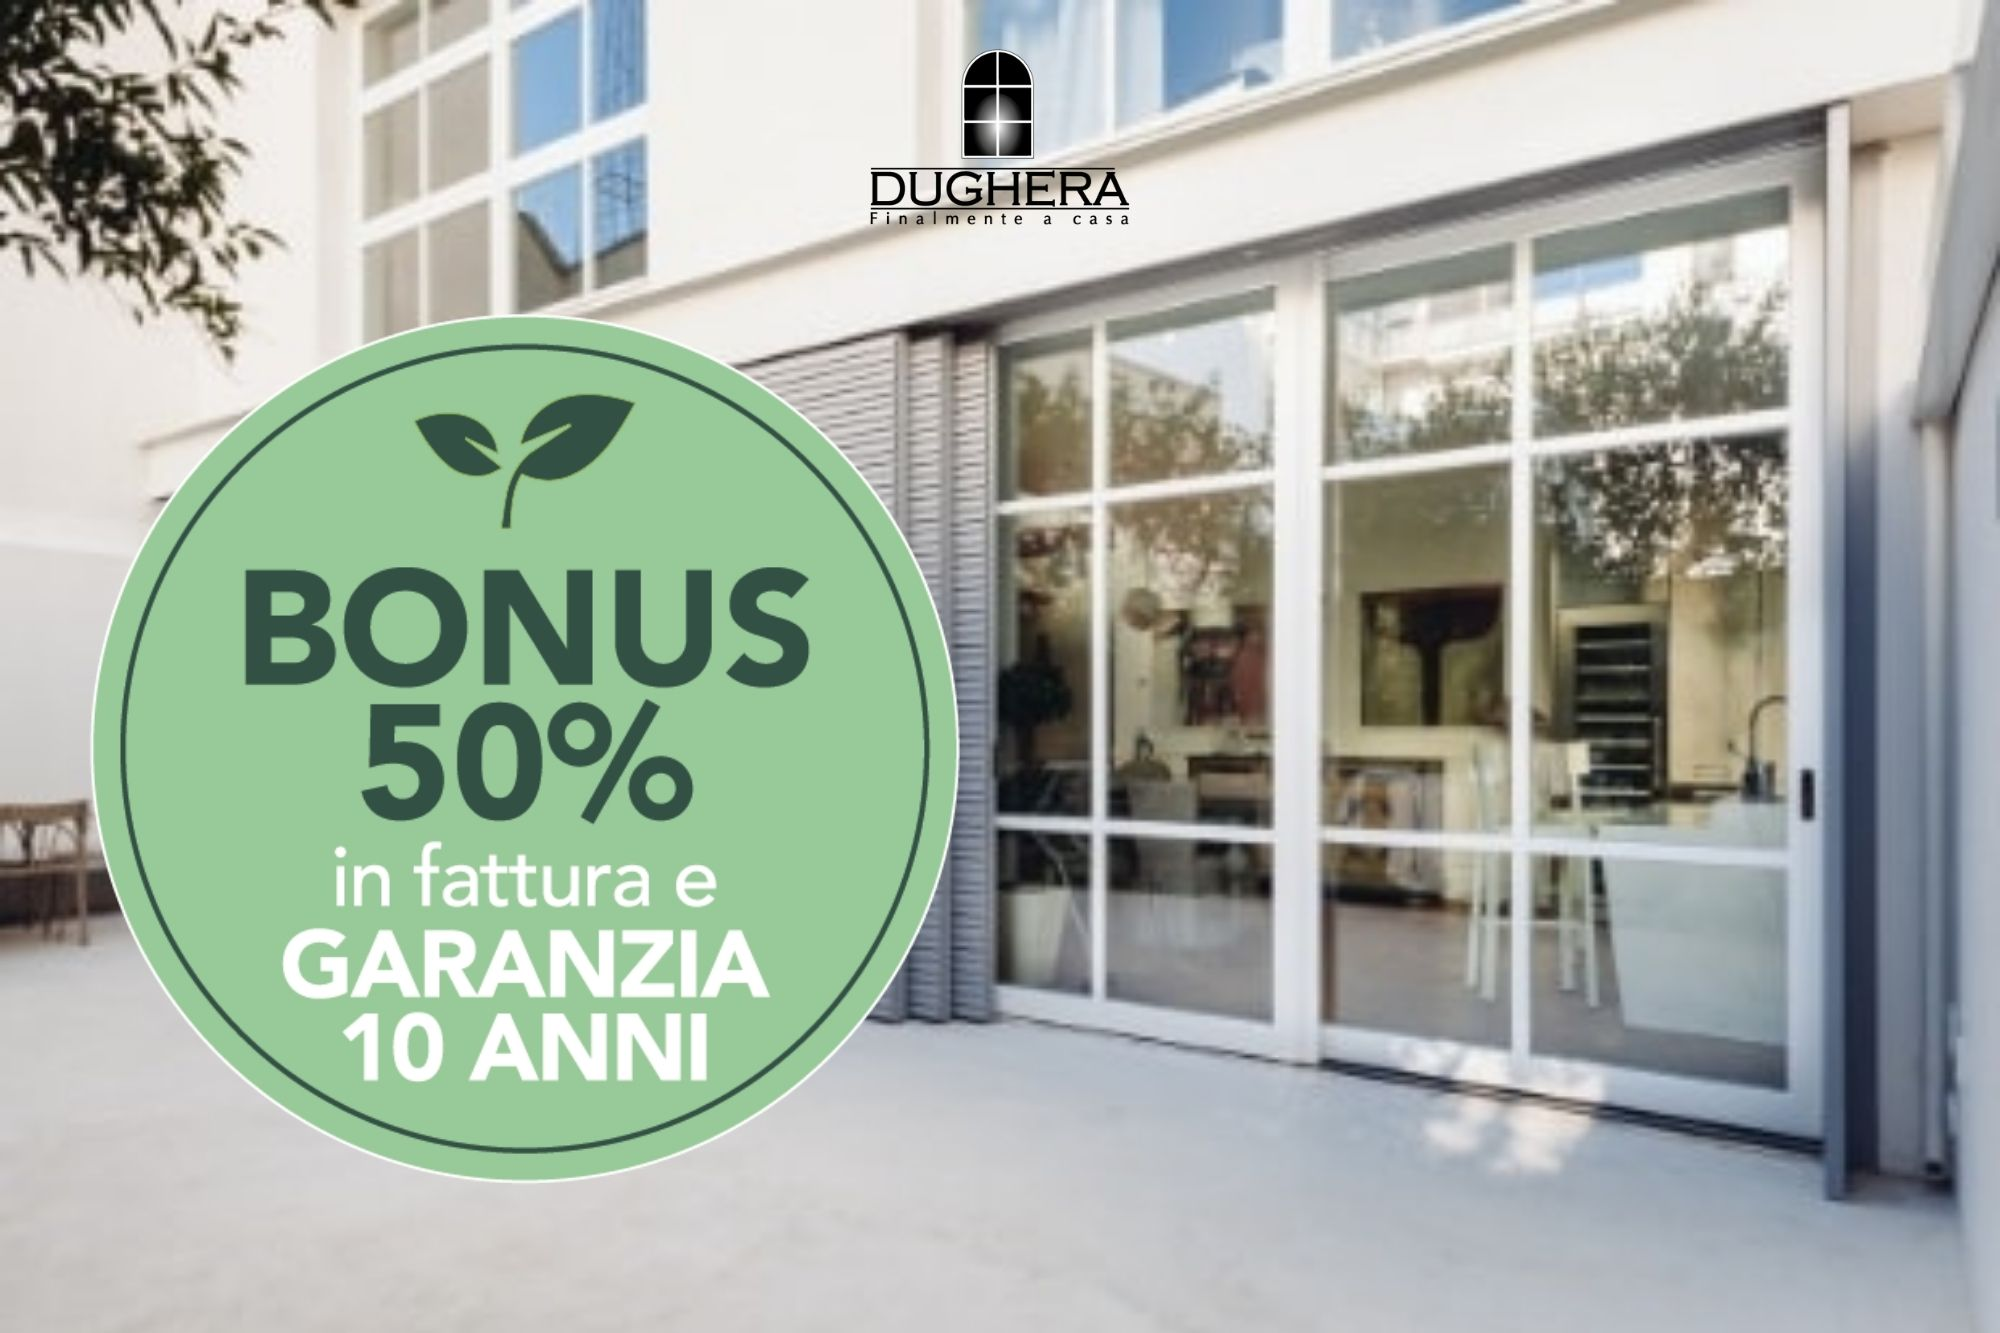 ecobonus news 50 fattura bonus sconto dughera garanzia